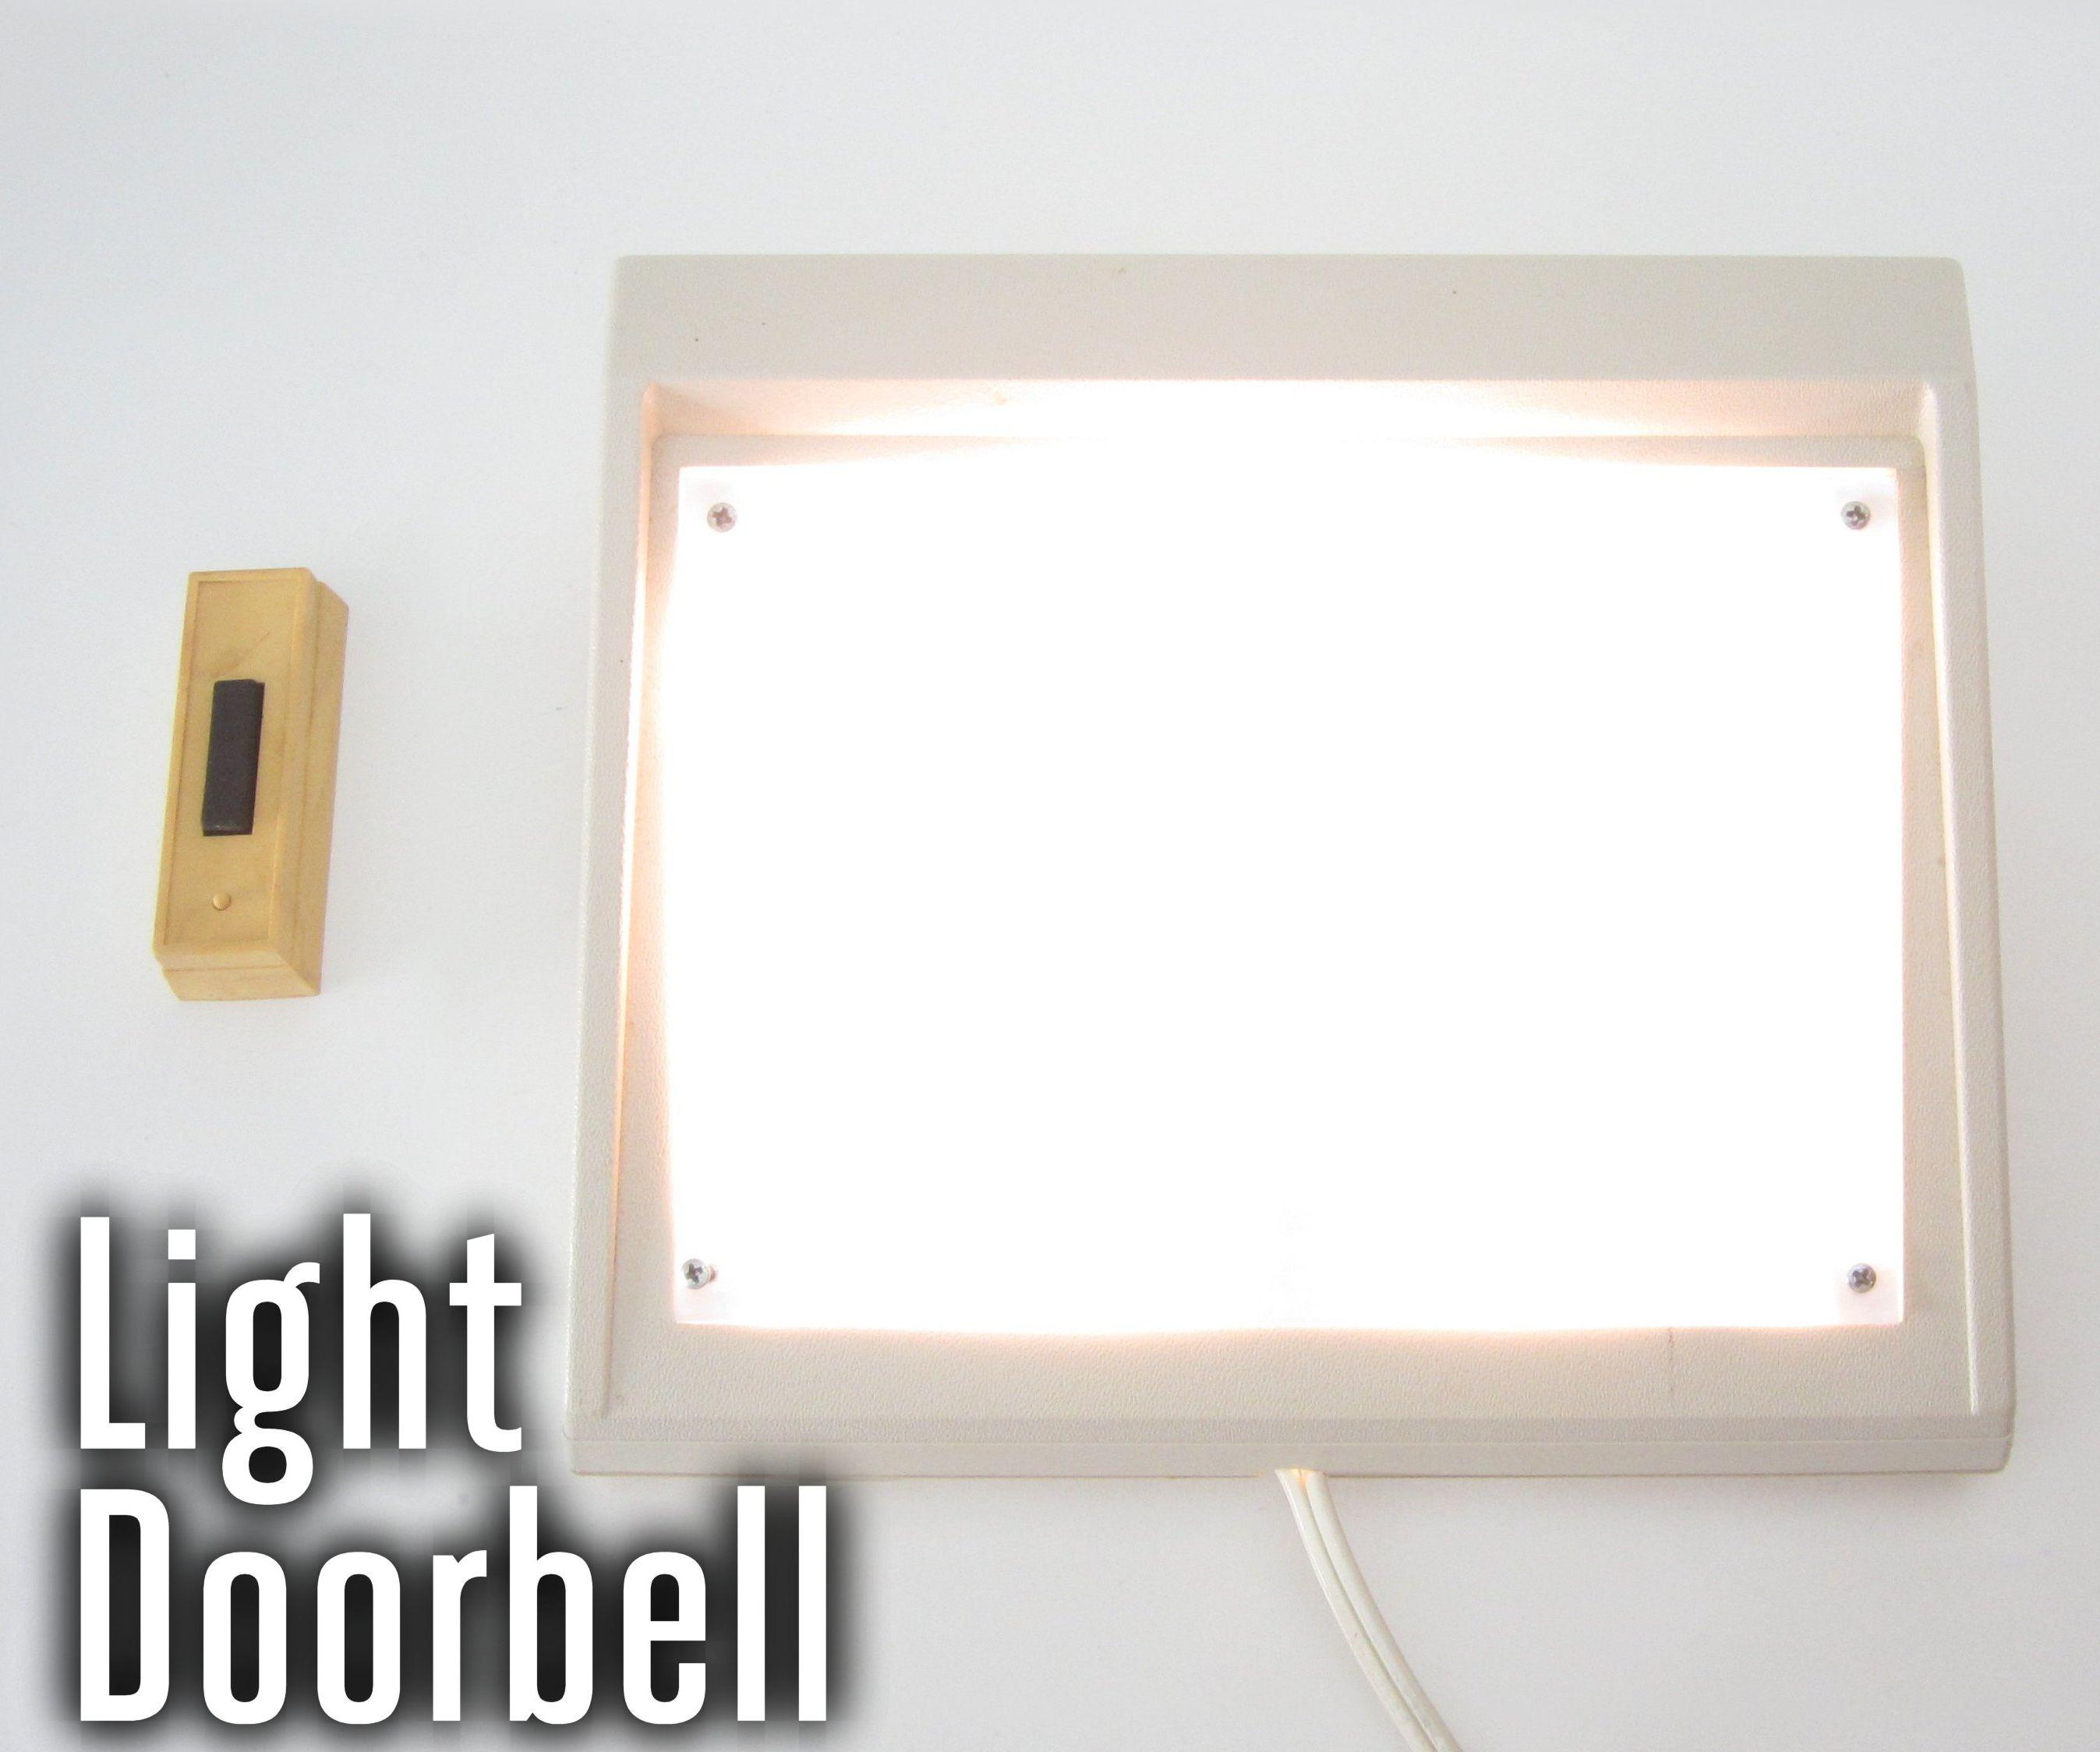 Doorbell that Turns on a Light